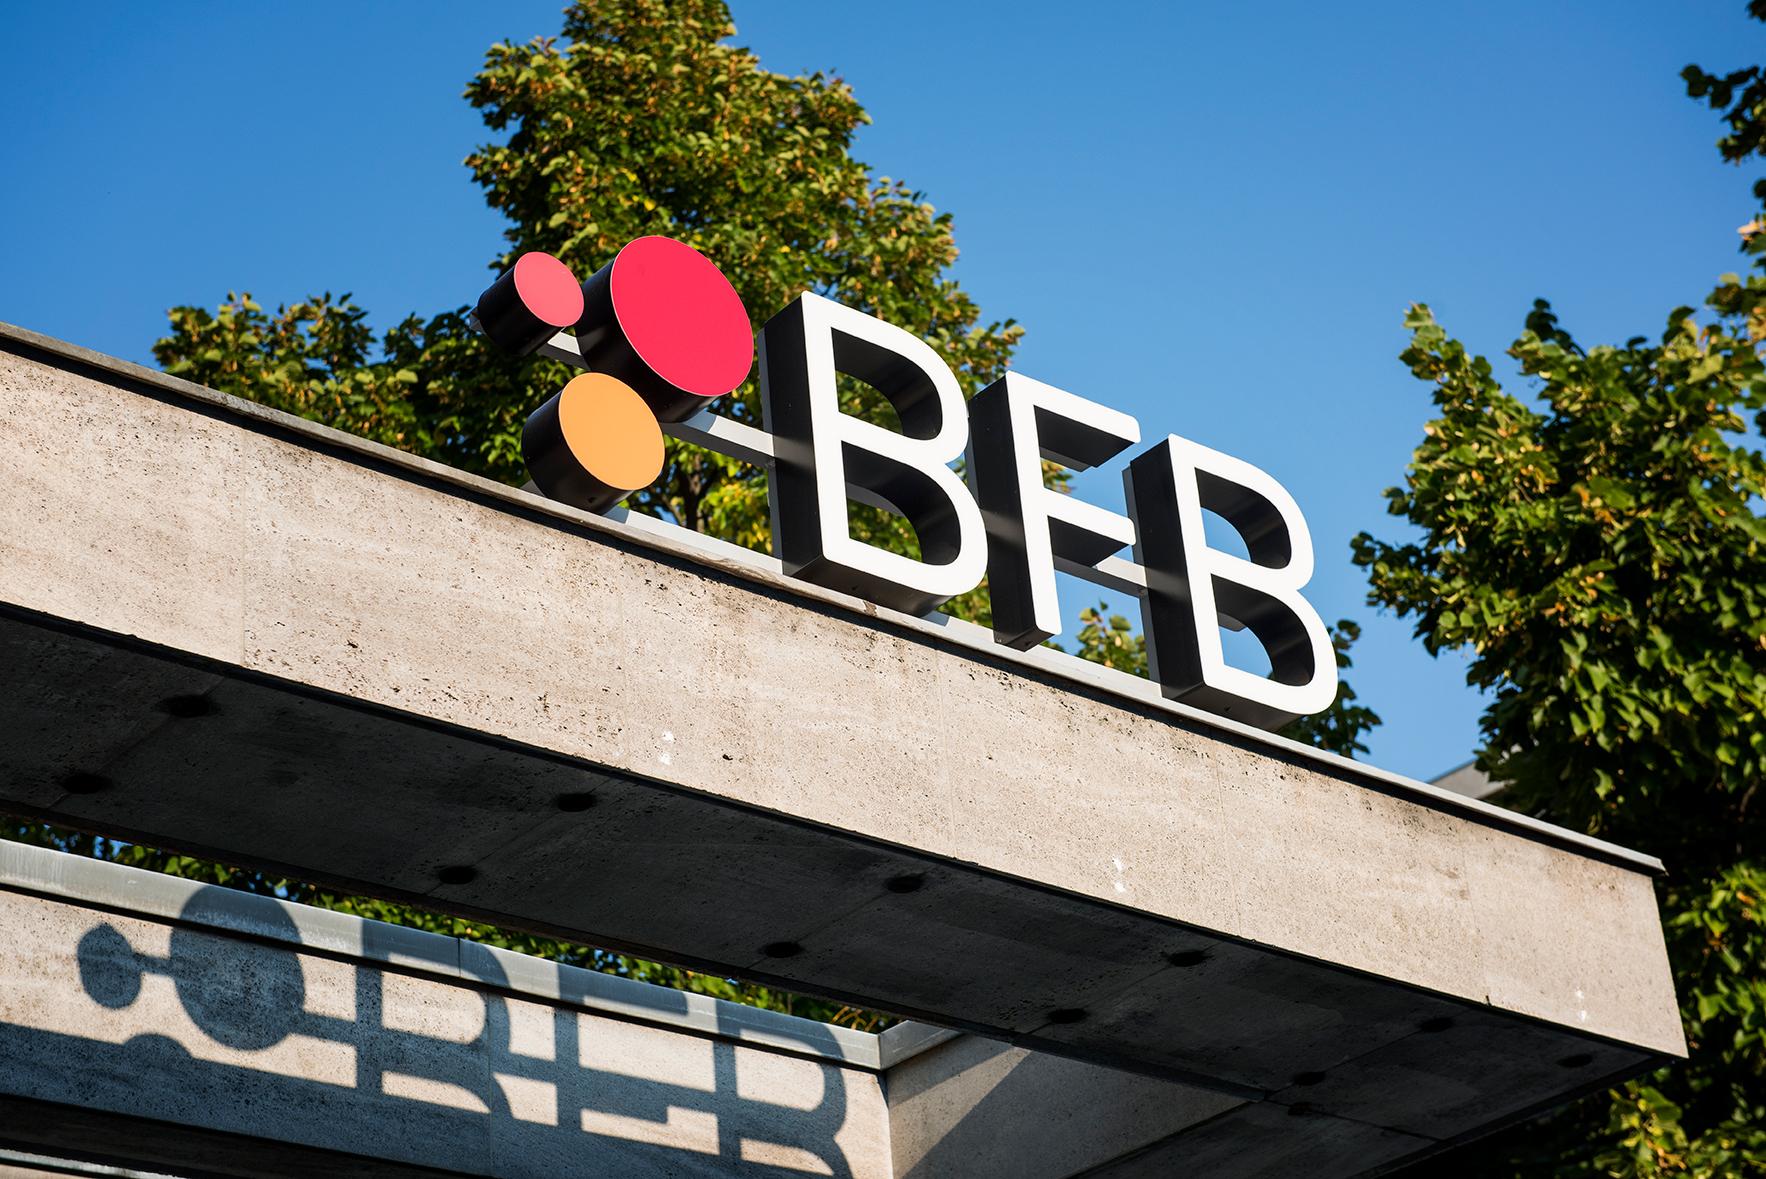 BFB BestMedia4Berlin GmbH